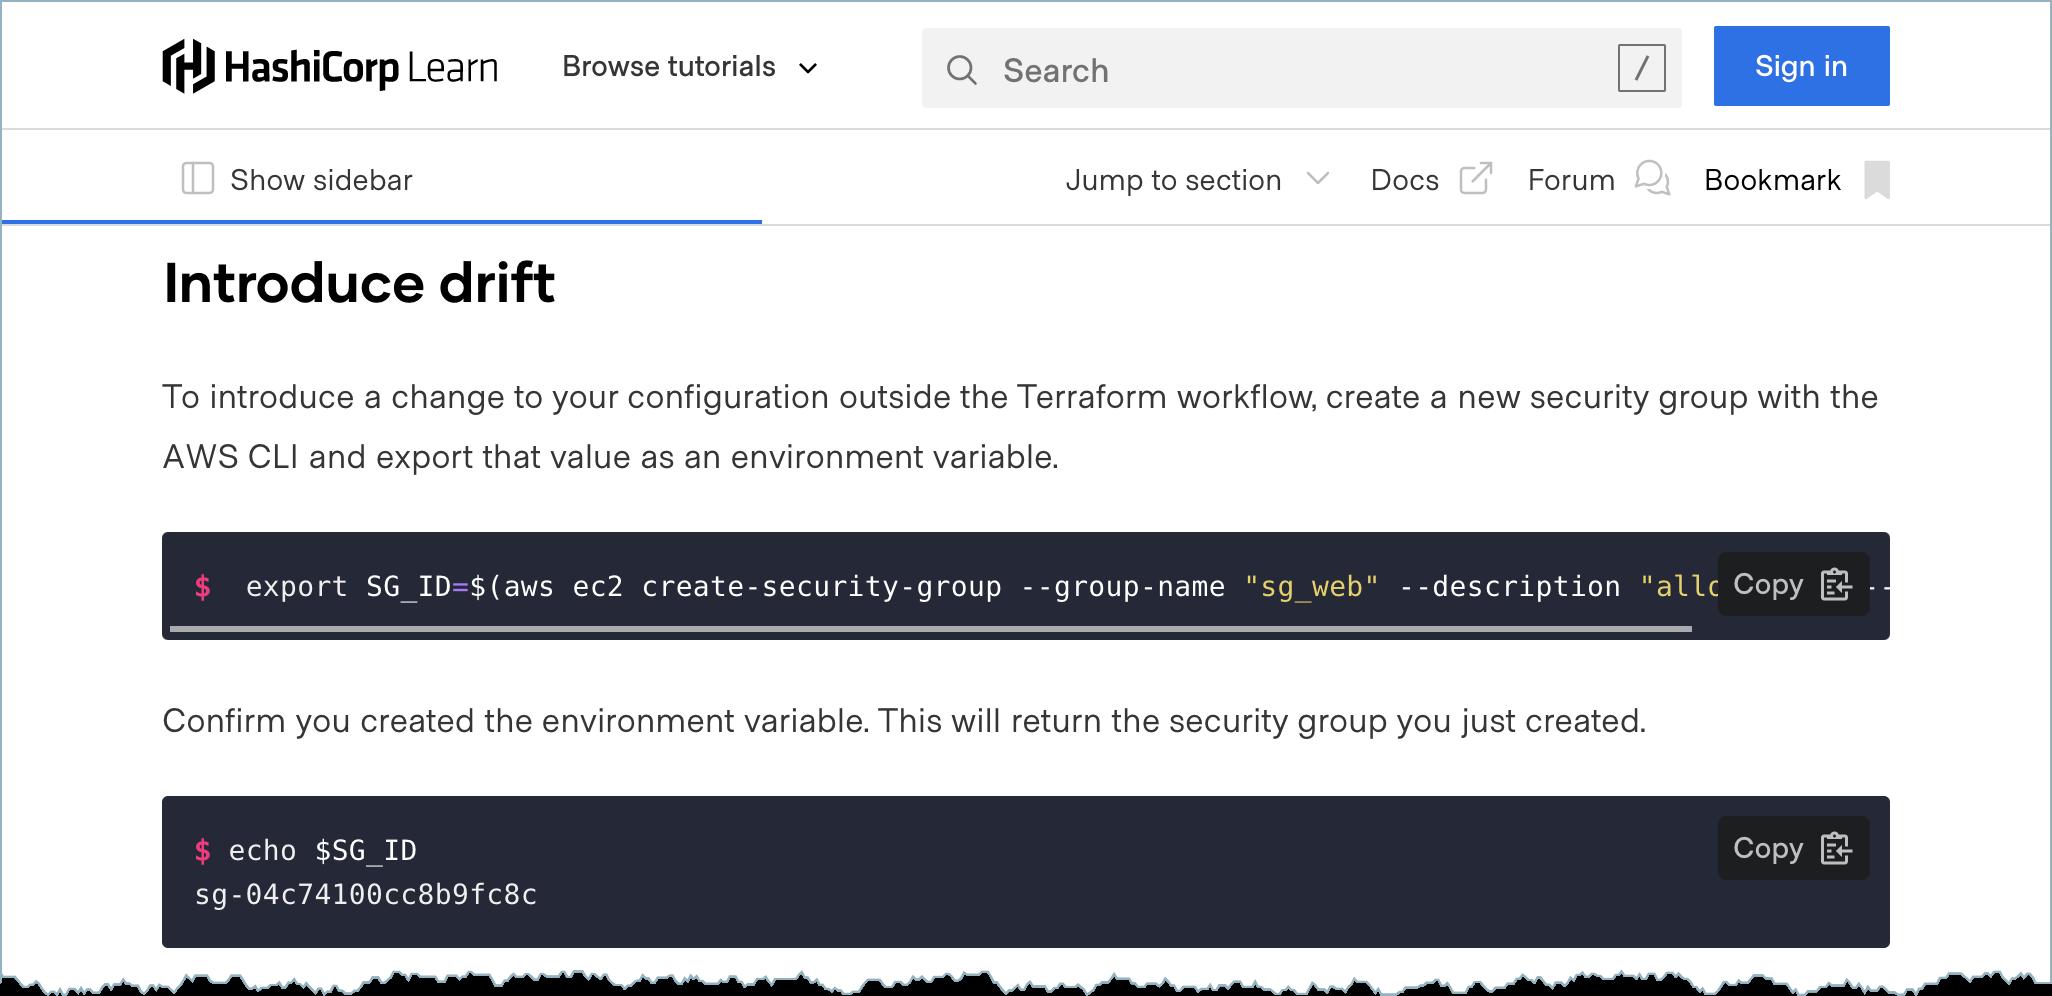 Configuration drift tutorial for HashiCorp Terraform